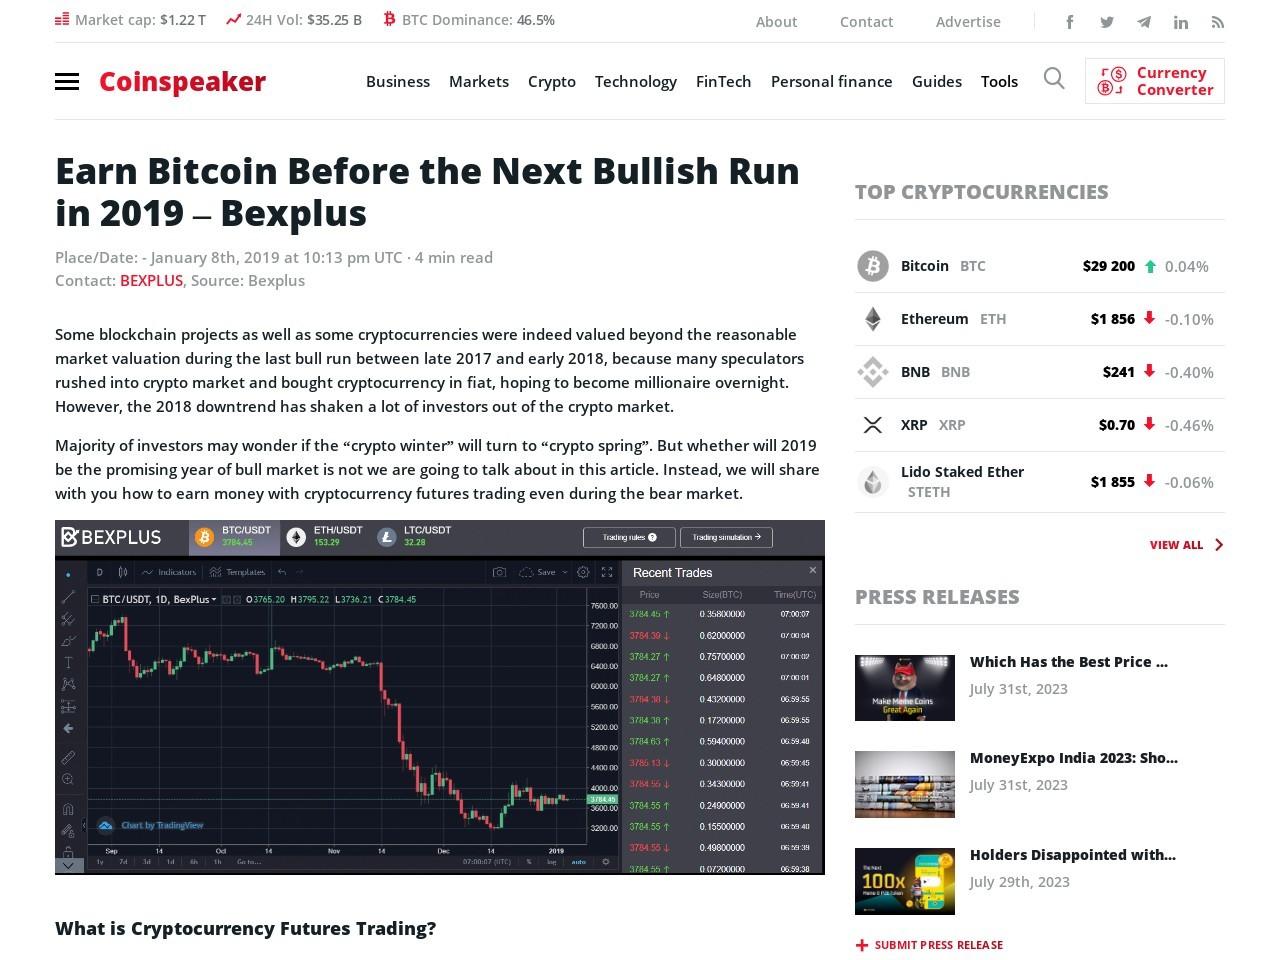 Earn Bitcoin Before the Next Bullish Run in 2019 – Bexplus